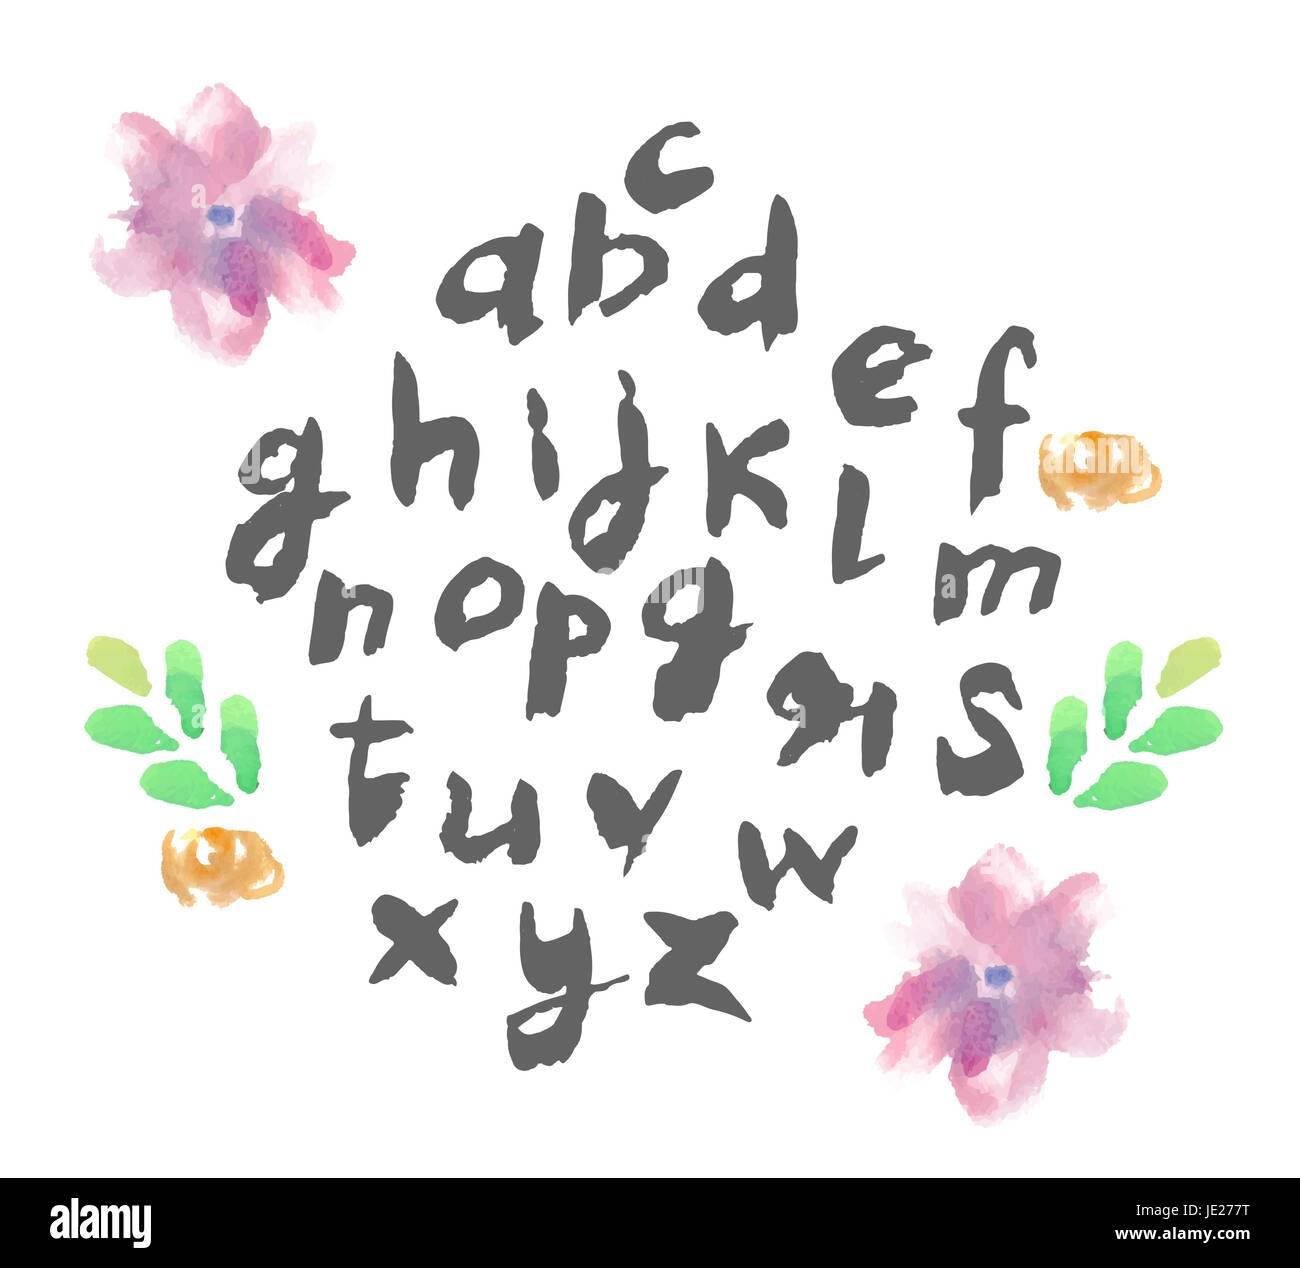 Hand Drawn Floral Alphabet Design Stockfotos & Hand Drawn Floral ...